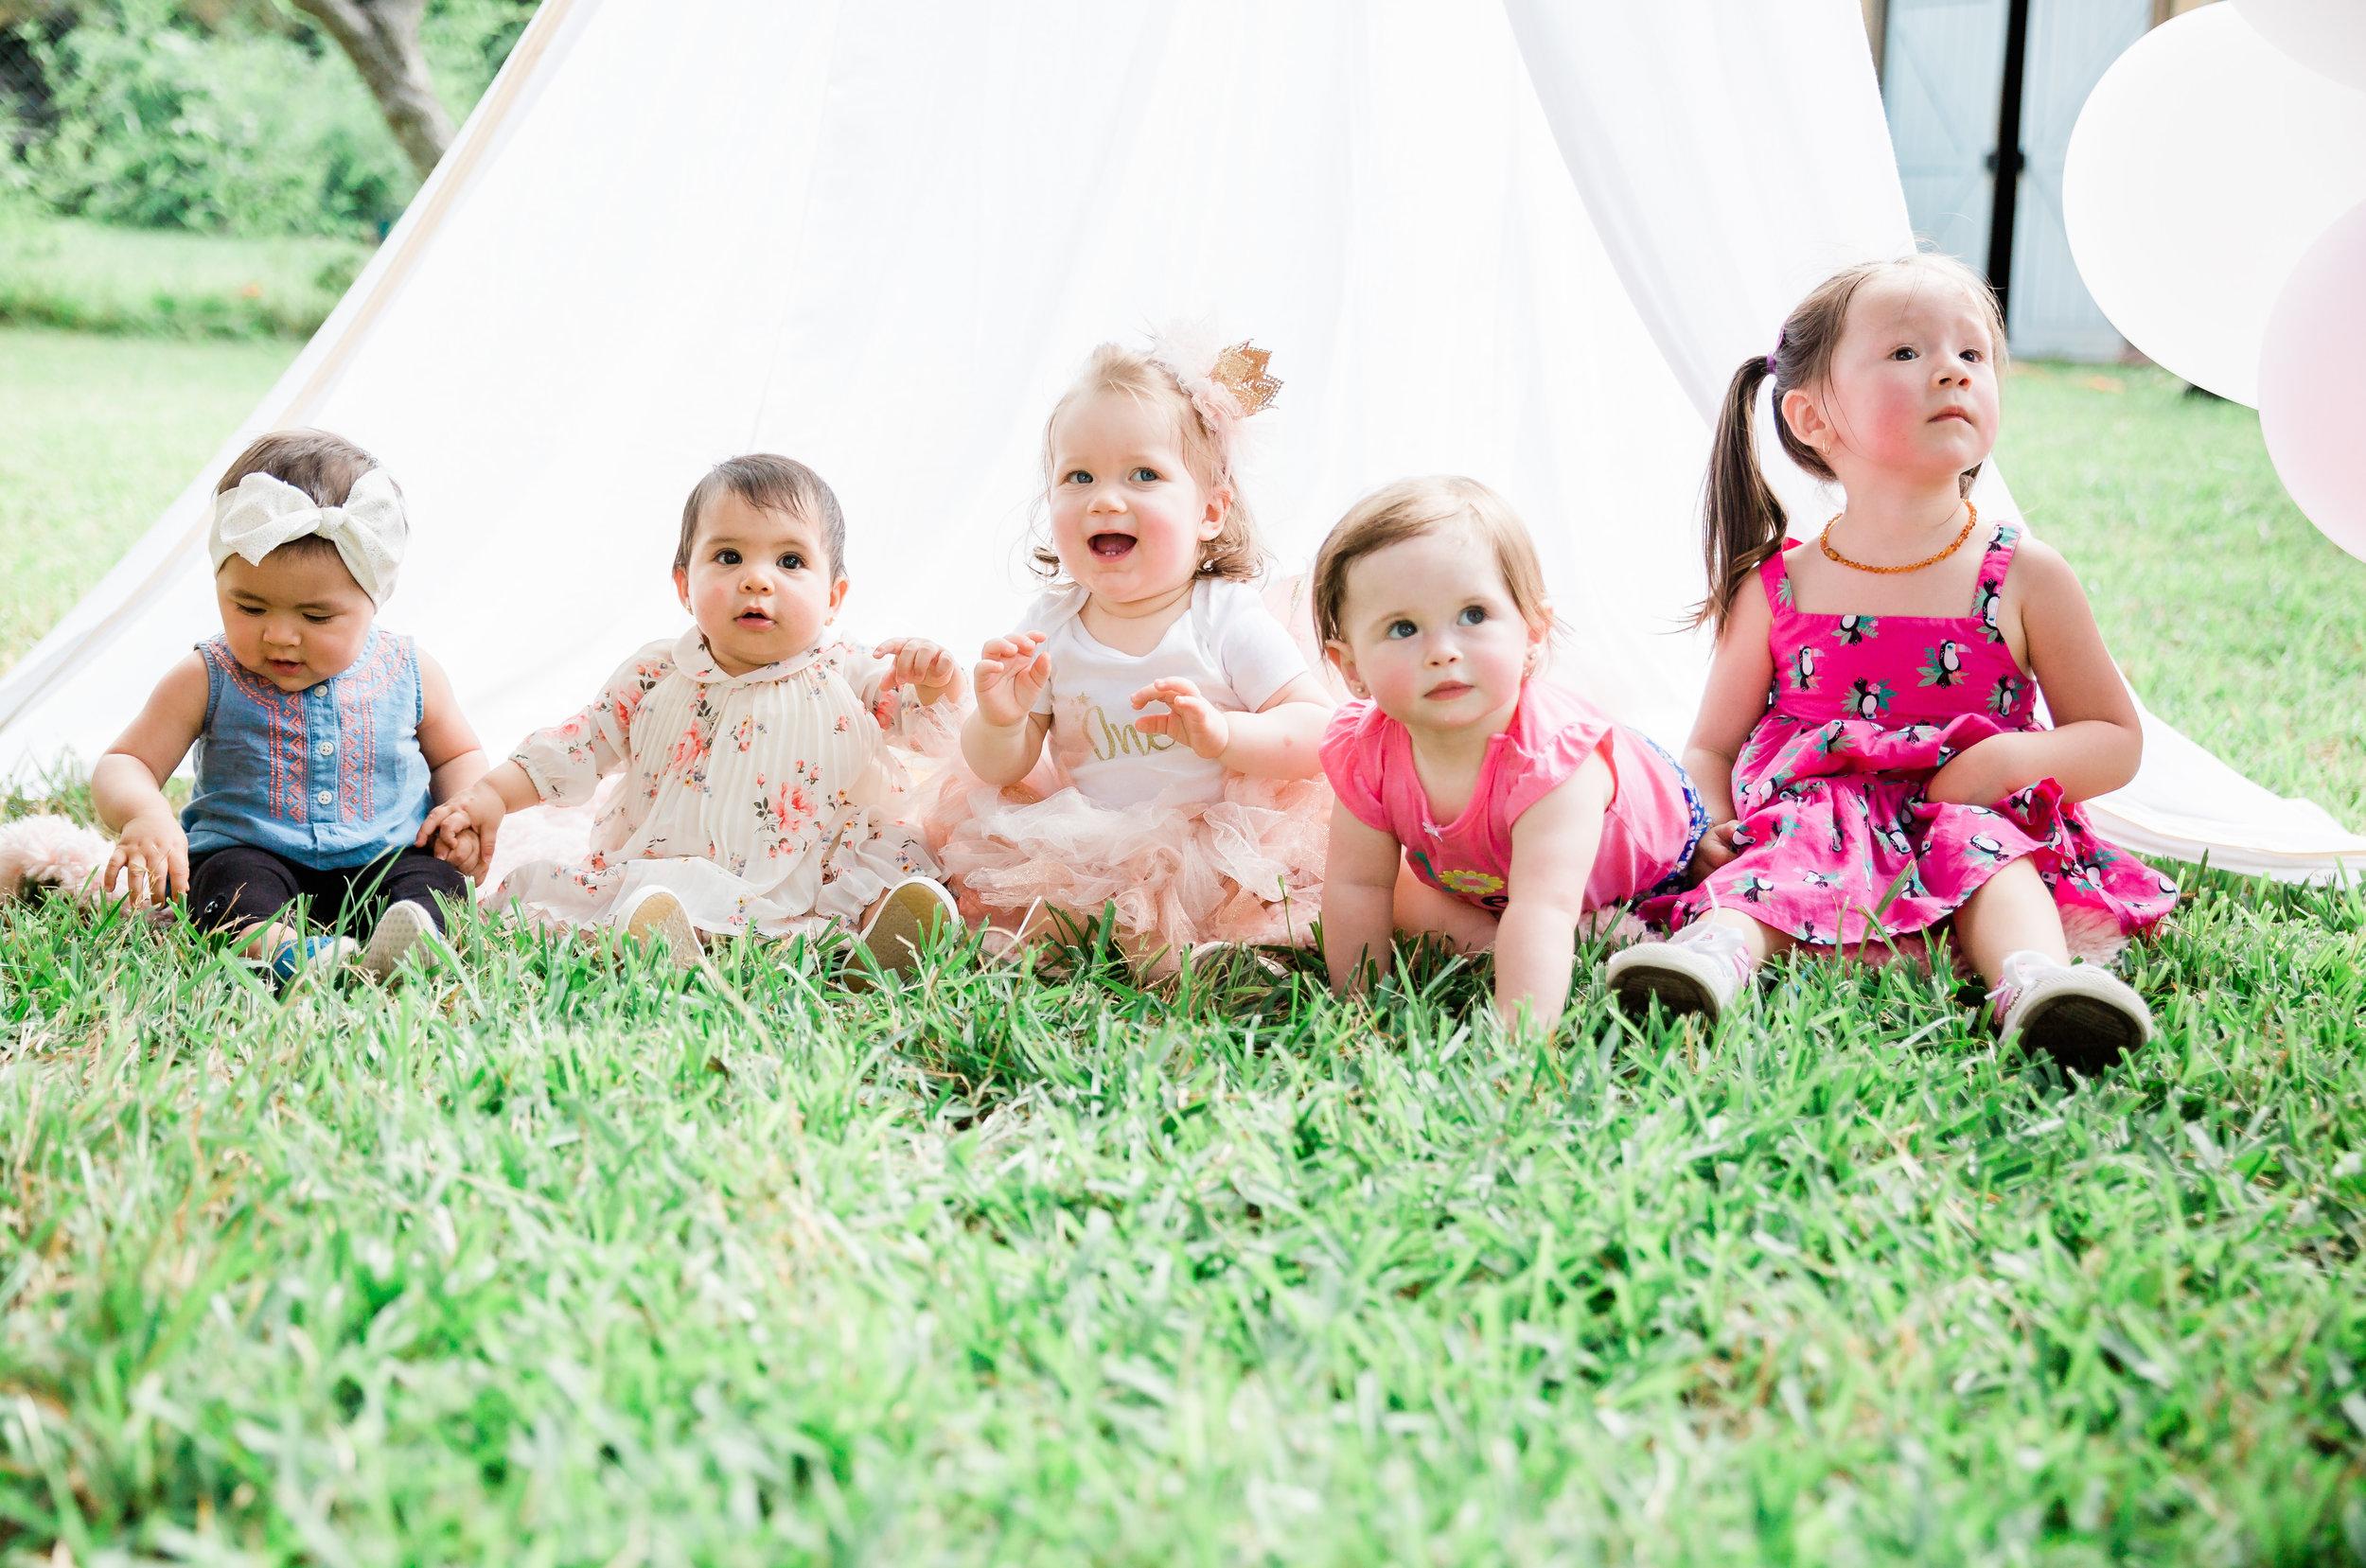 nashville-franklin-lifestyle-photographer-kids-birthday-43.jpg